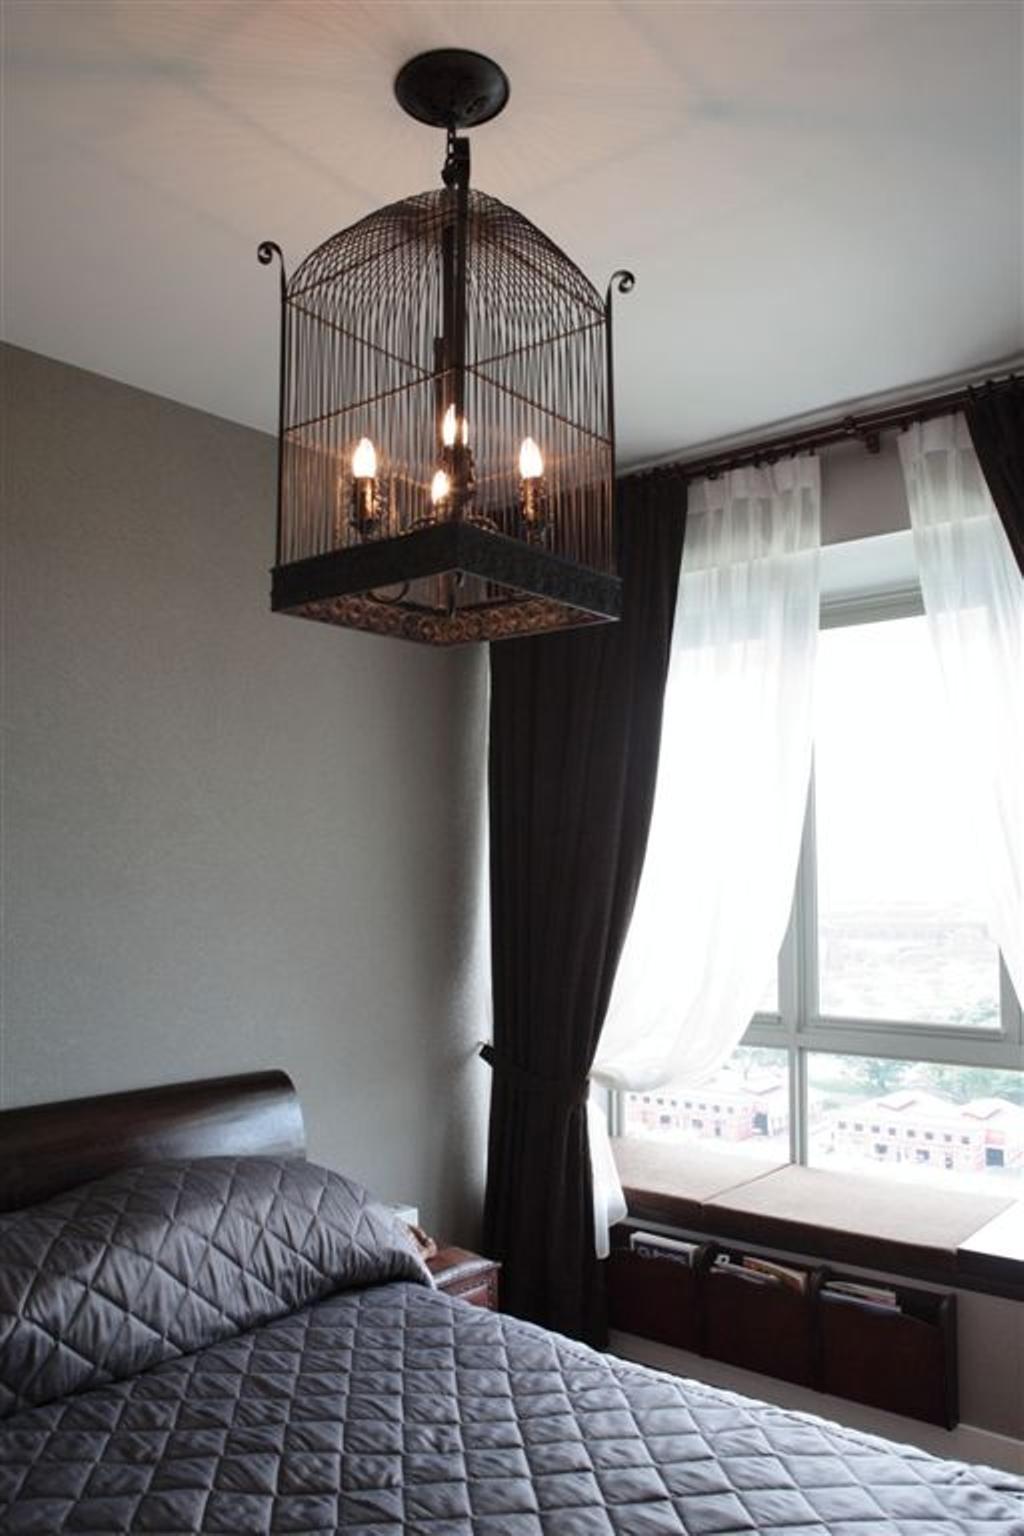 Vintage, Condo, Bedroom, Mounbatten Riveredge, Interior Designer, Free Space Intent, Lantern Lamp, Curtains, Lantern, Caged Lamp, Cage Lamp, Bay Window, Window Ledge, Window Seat, Fireplace, Hearth